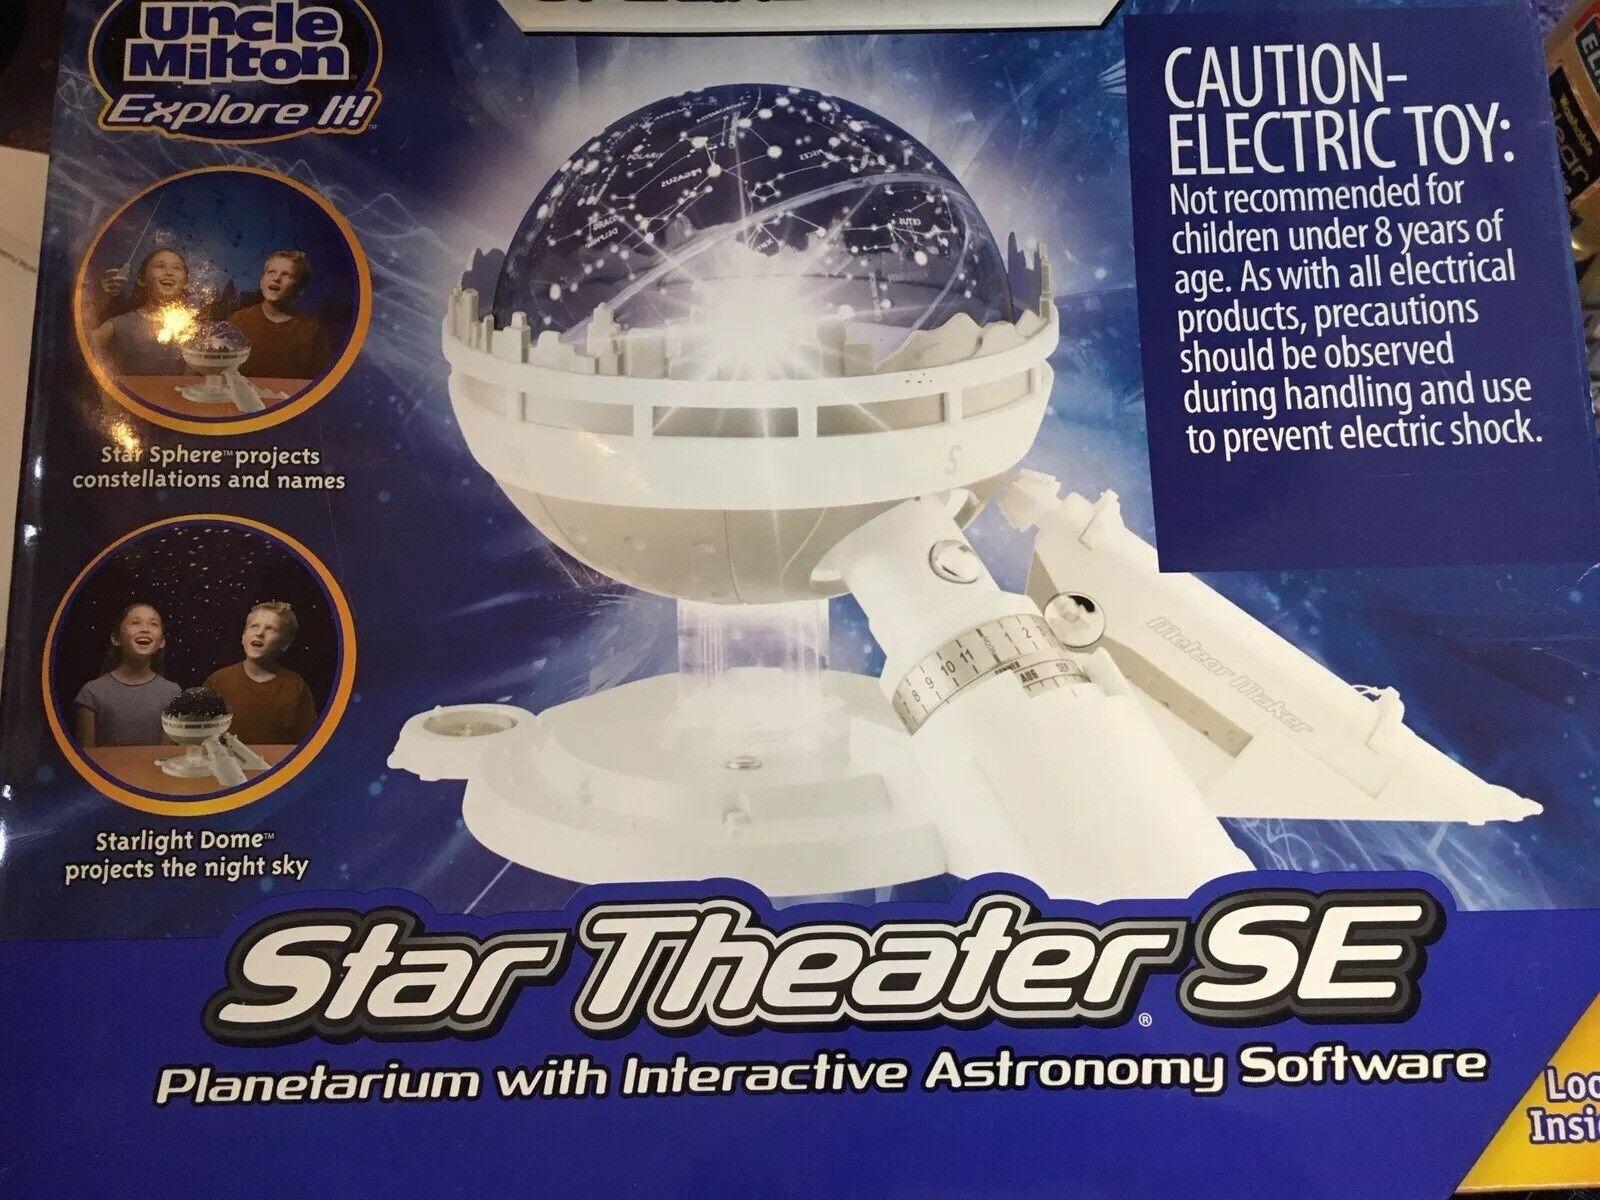 New Star Theater interactive Planetarium set and cosmic nightlight